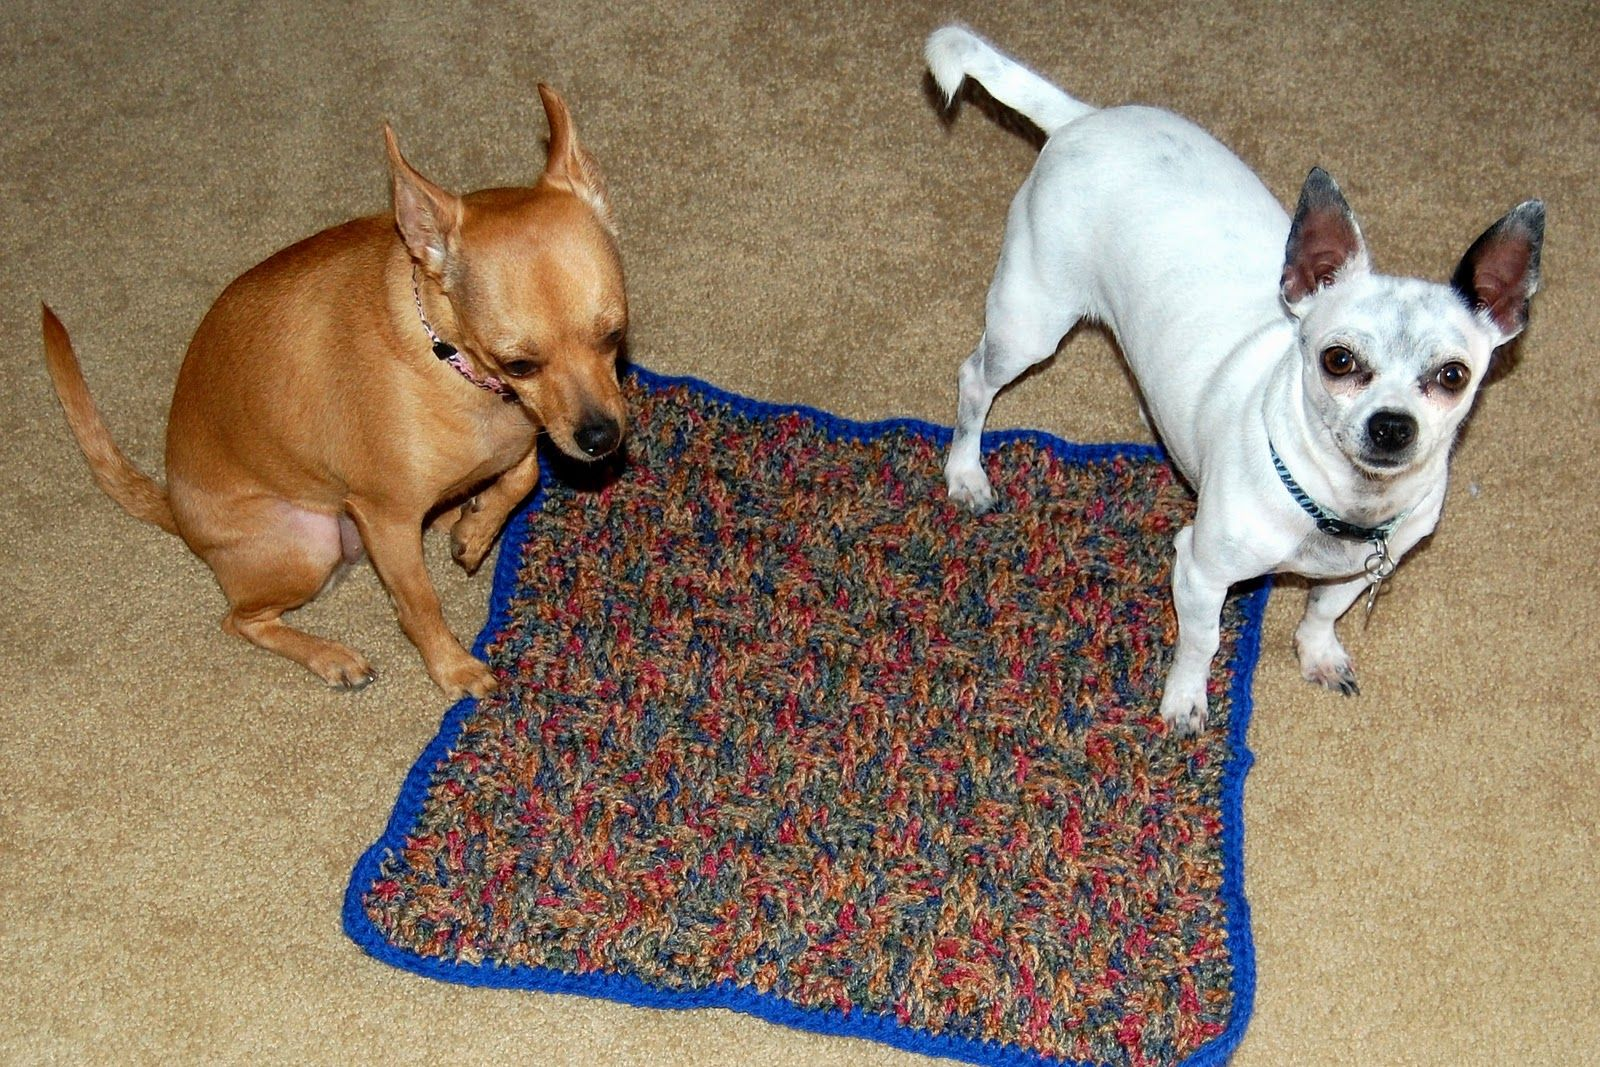 crochet for dogs   Posh Pooch Designs Dog Clothes: Crochet pattern ...